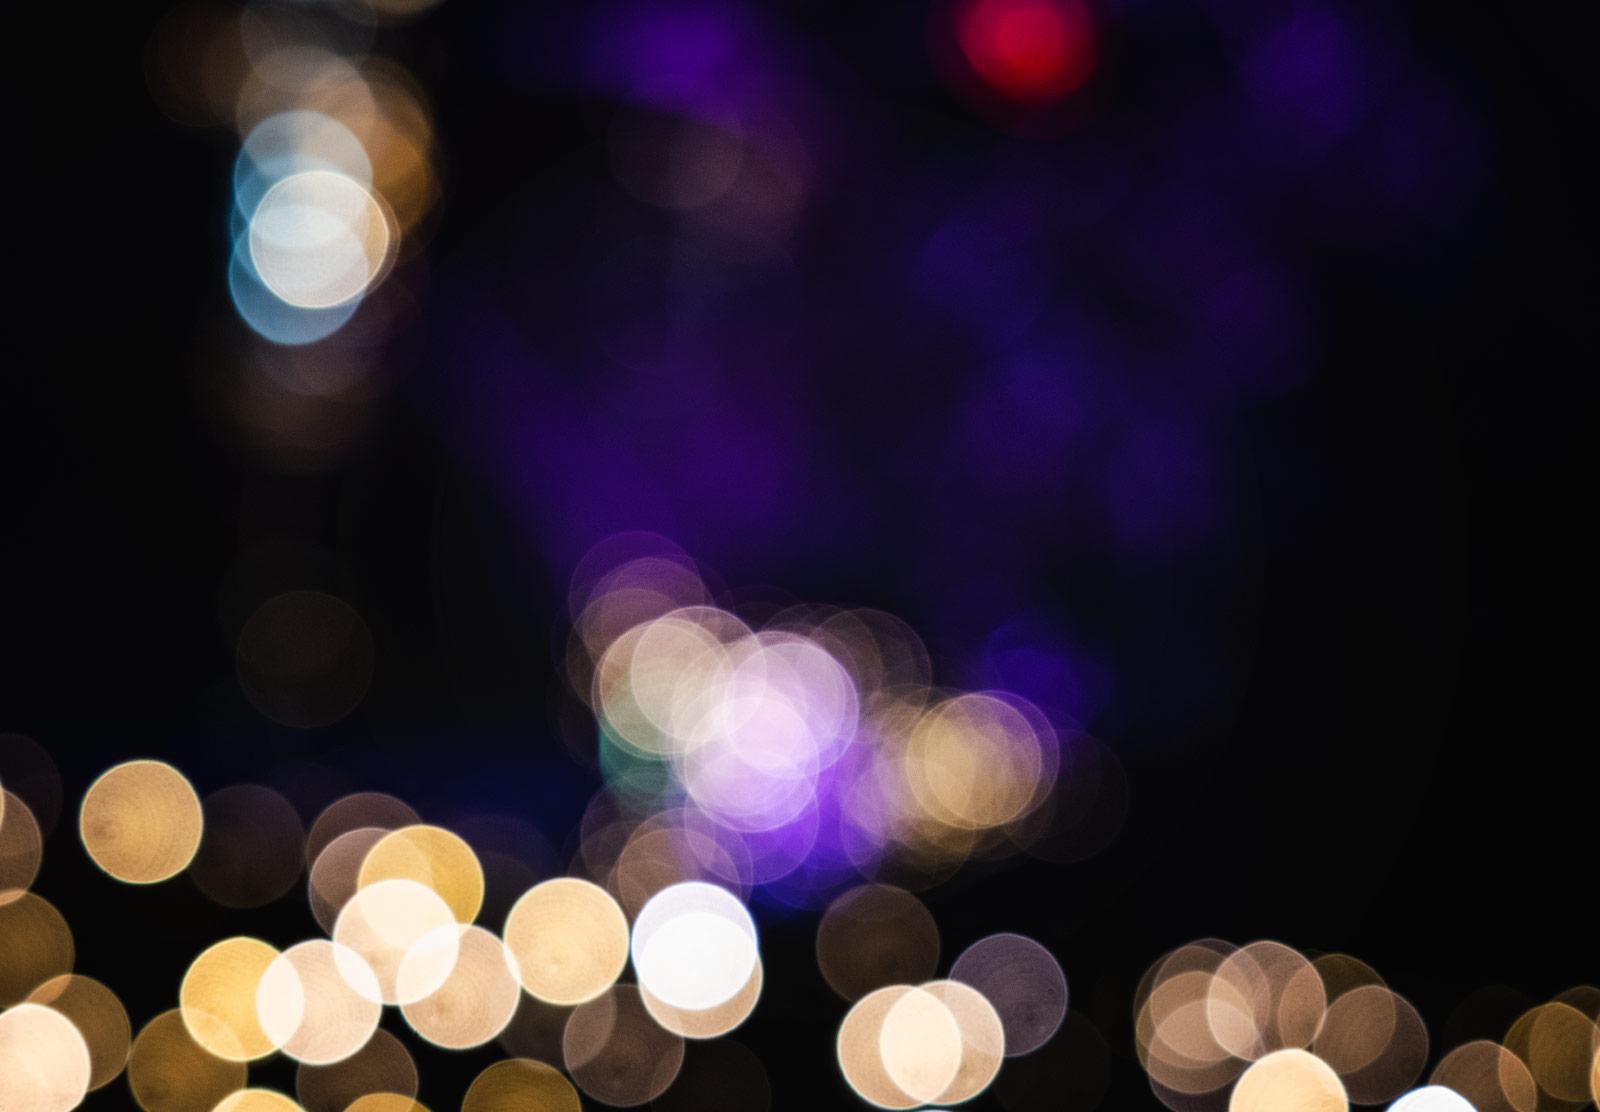 Blurred colourful lights